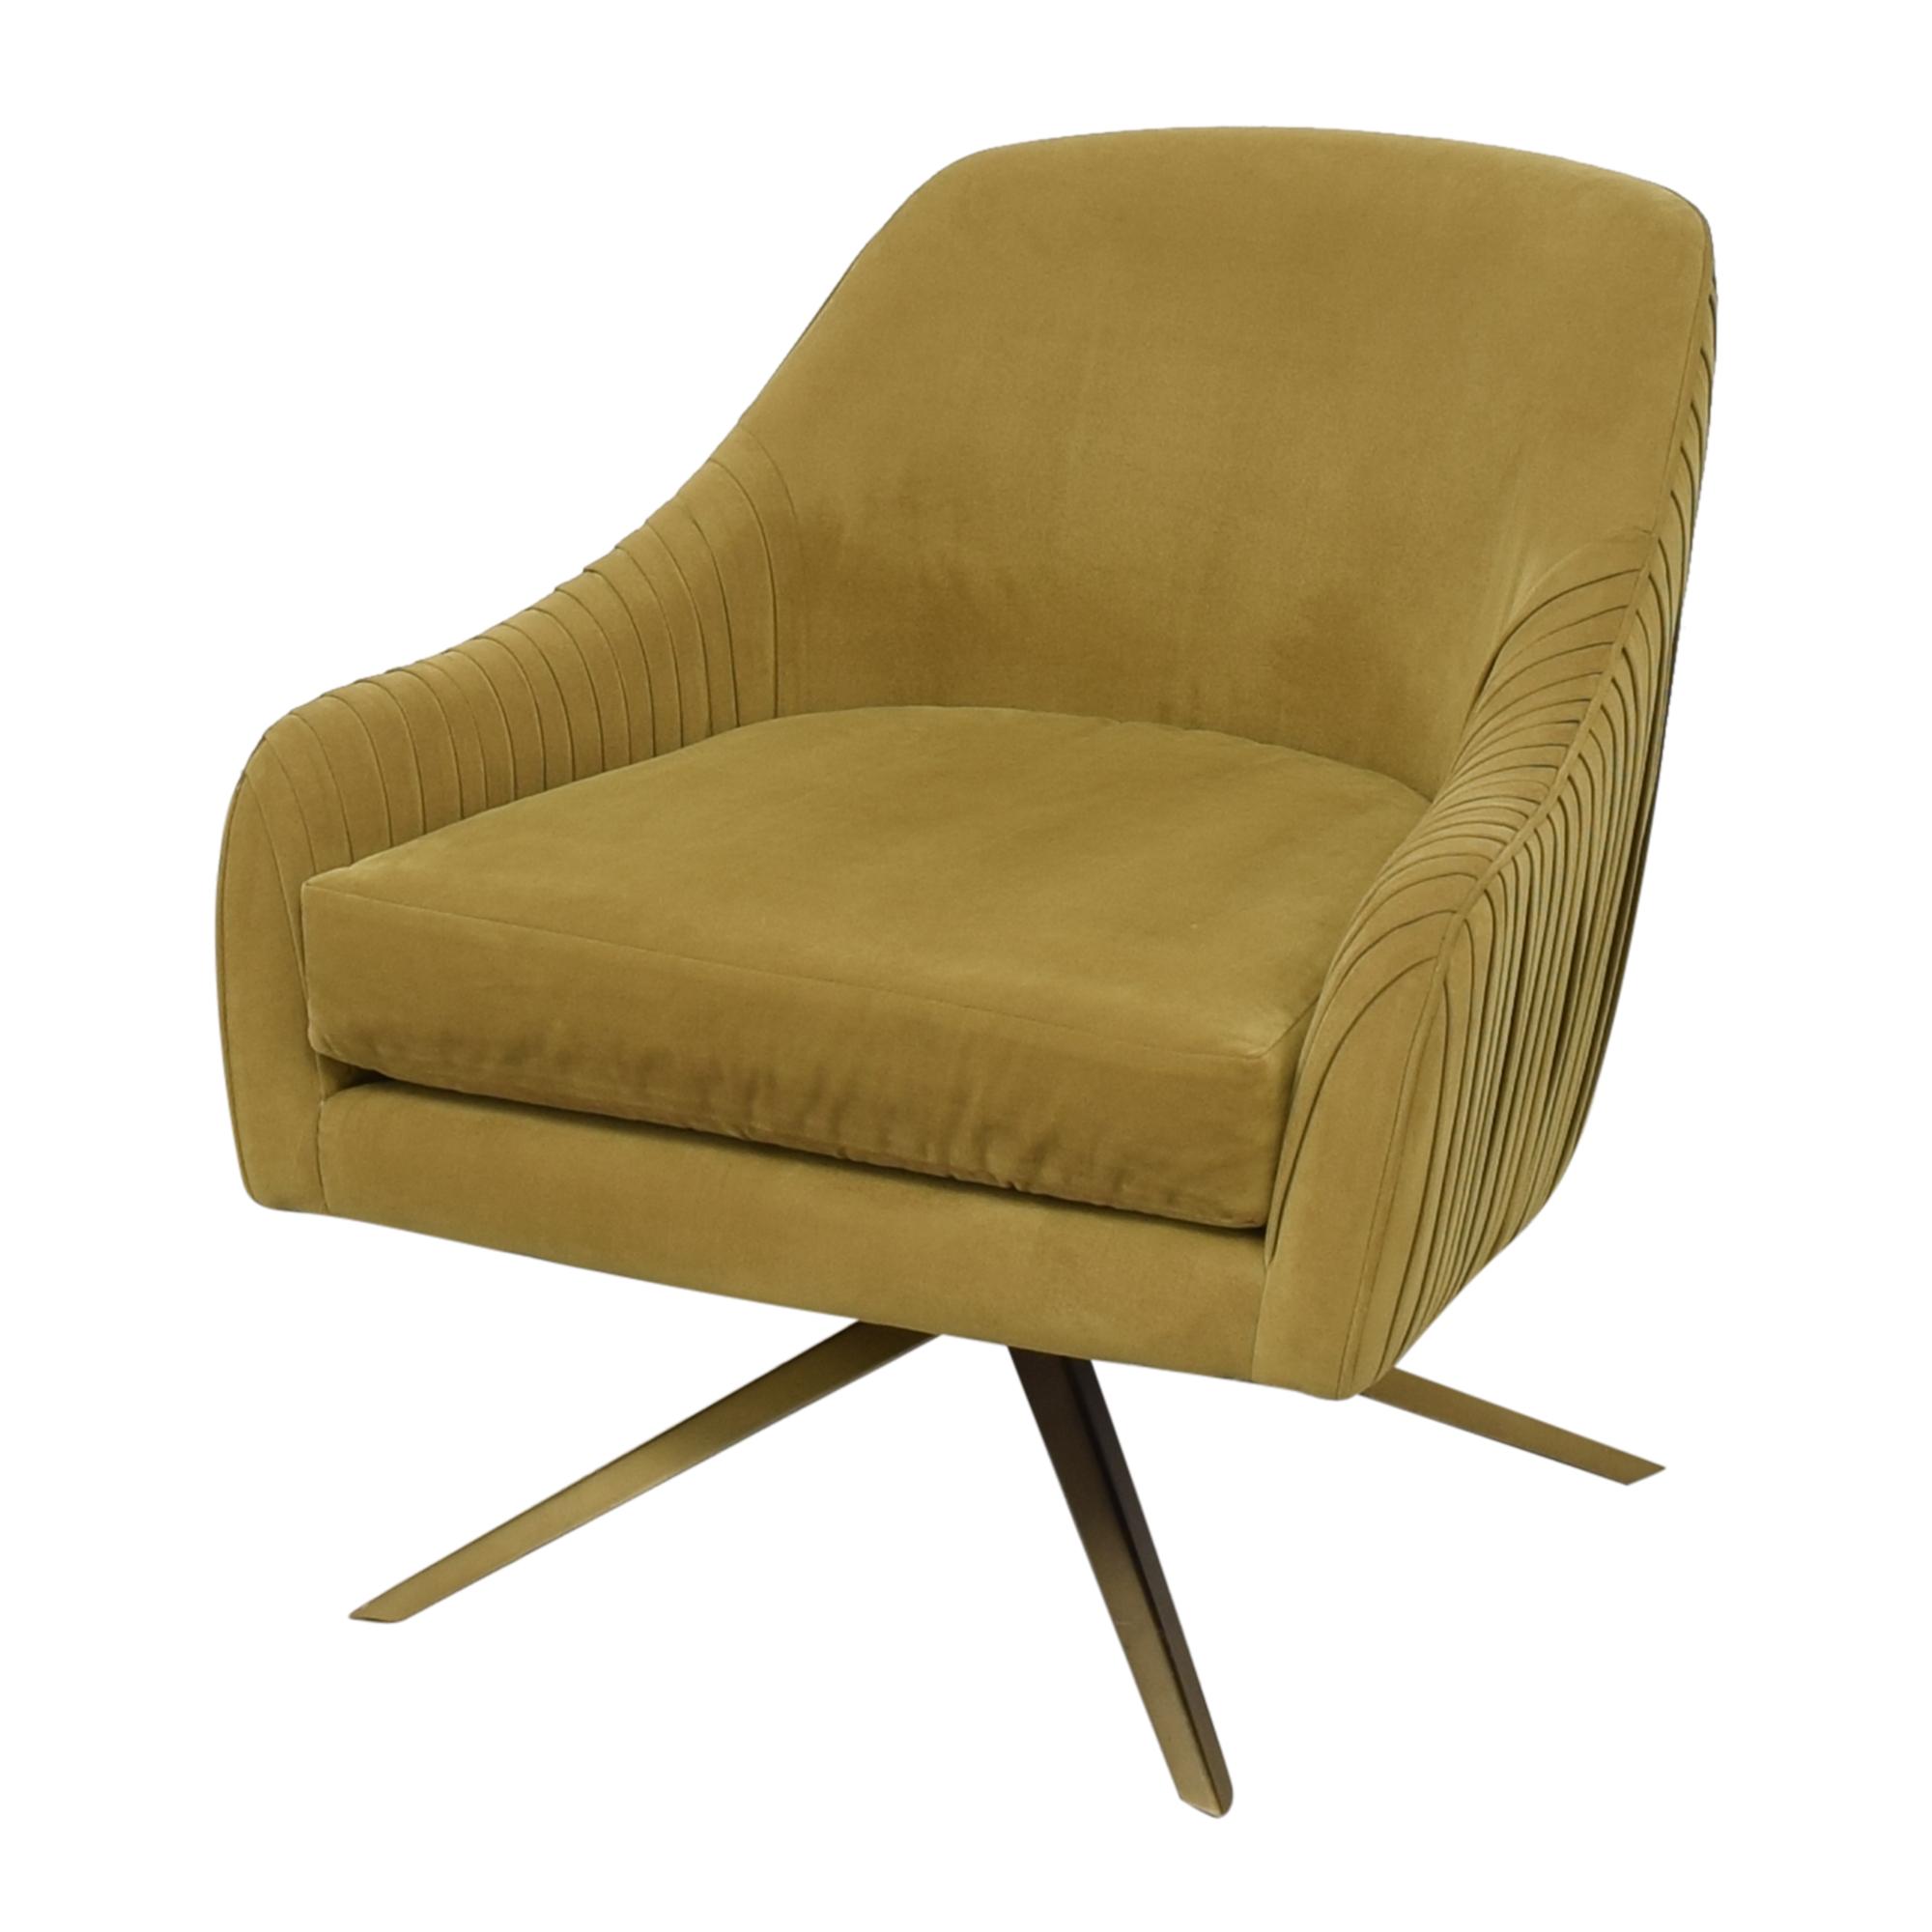 West Elm West Elm Roar & Rabbit Pleated Swivel Chair Chairs